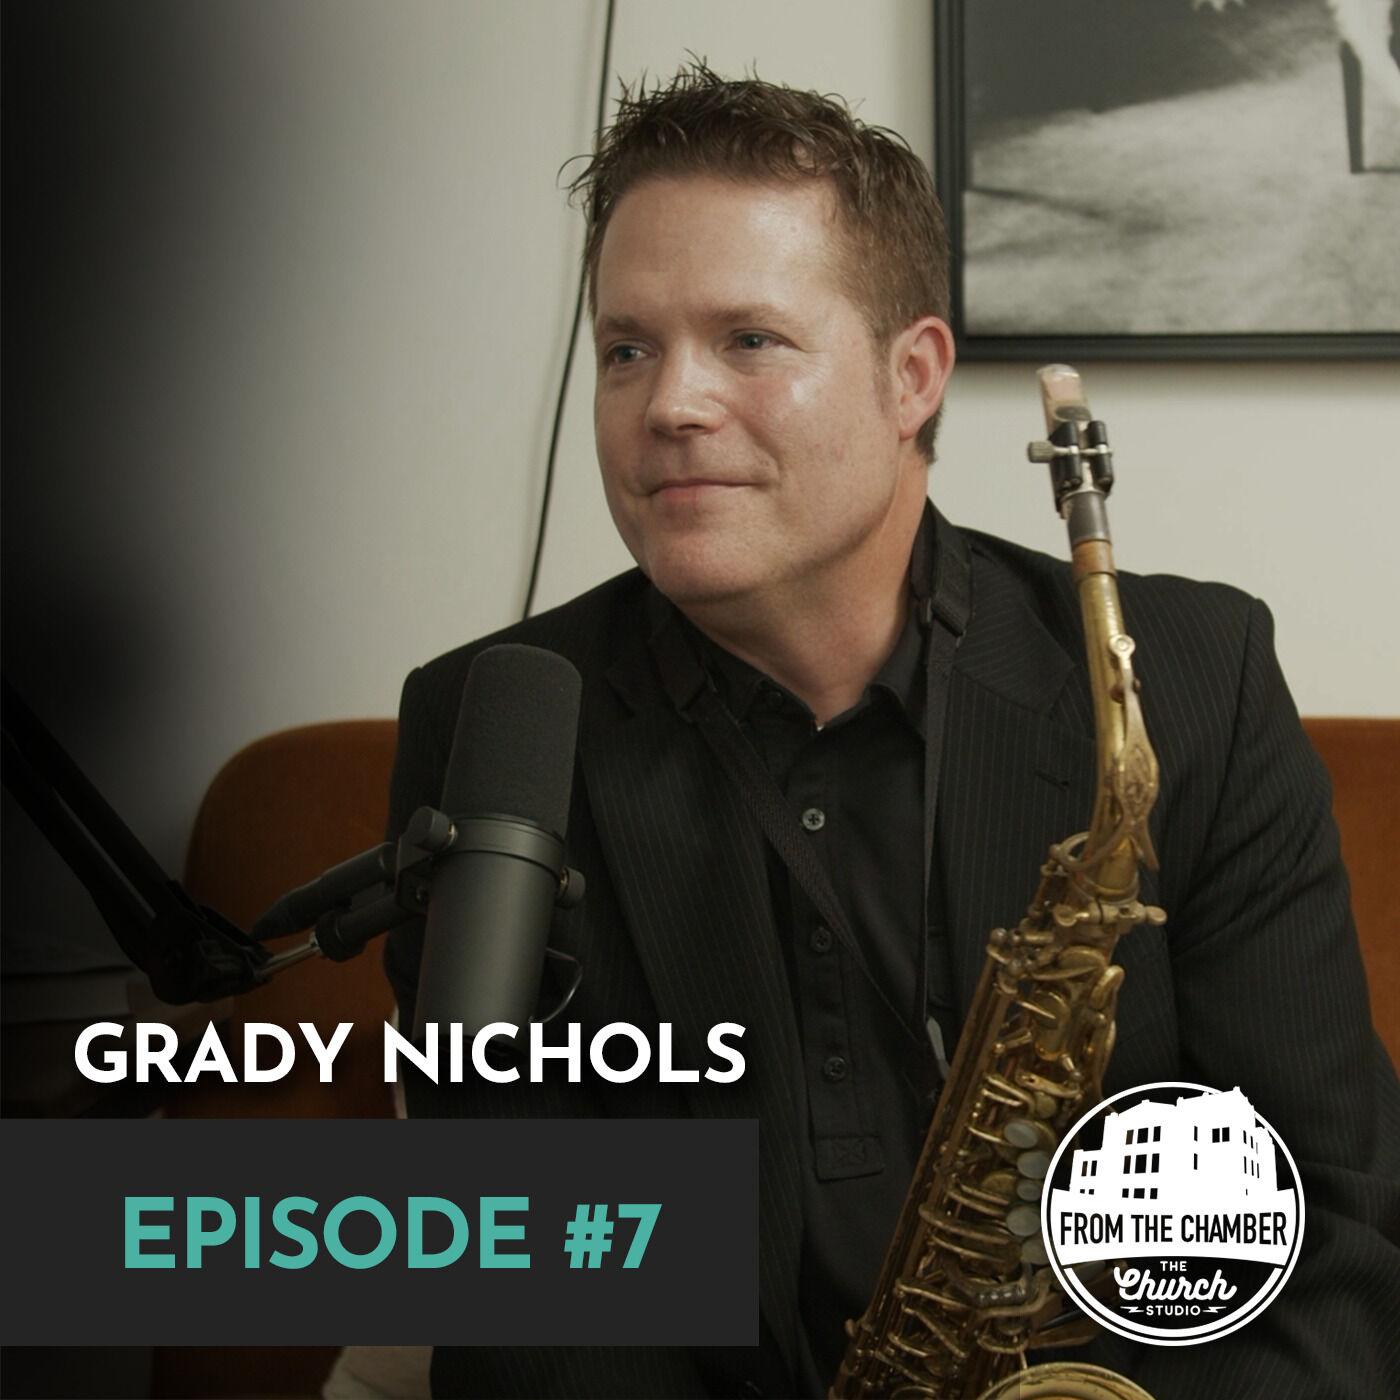 EPISODE 7 - GRADY NICHOLS